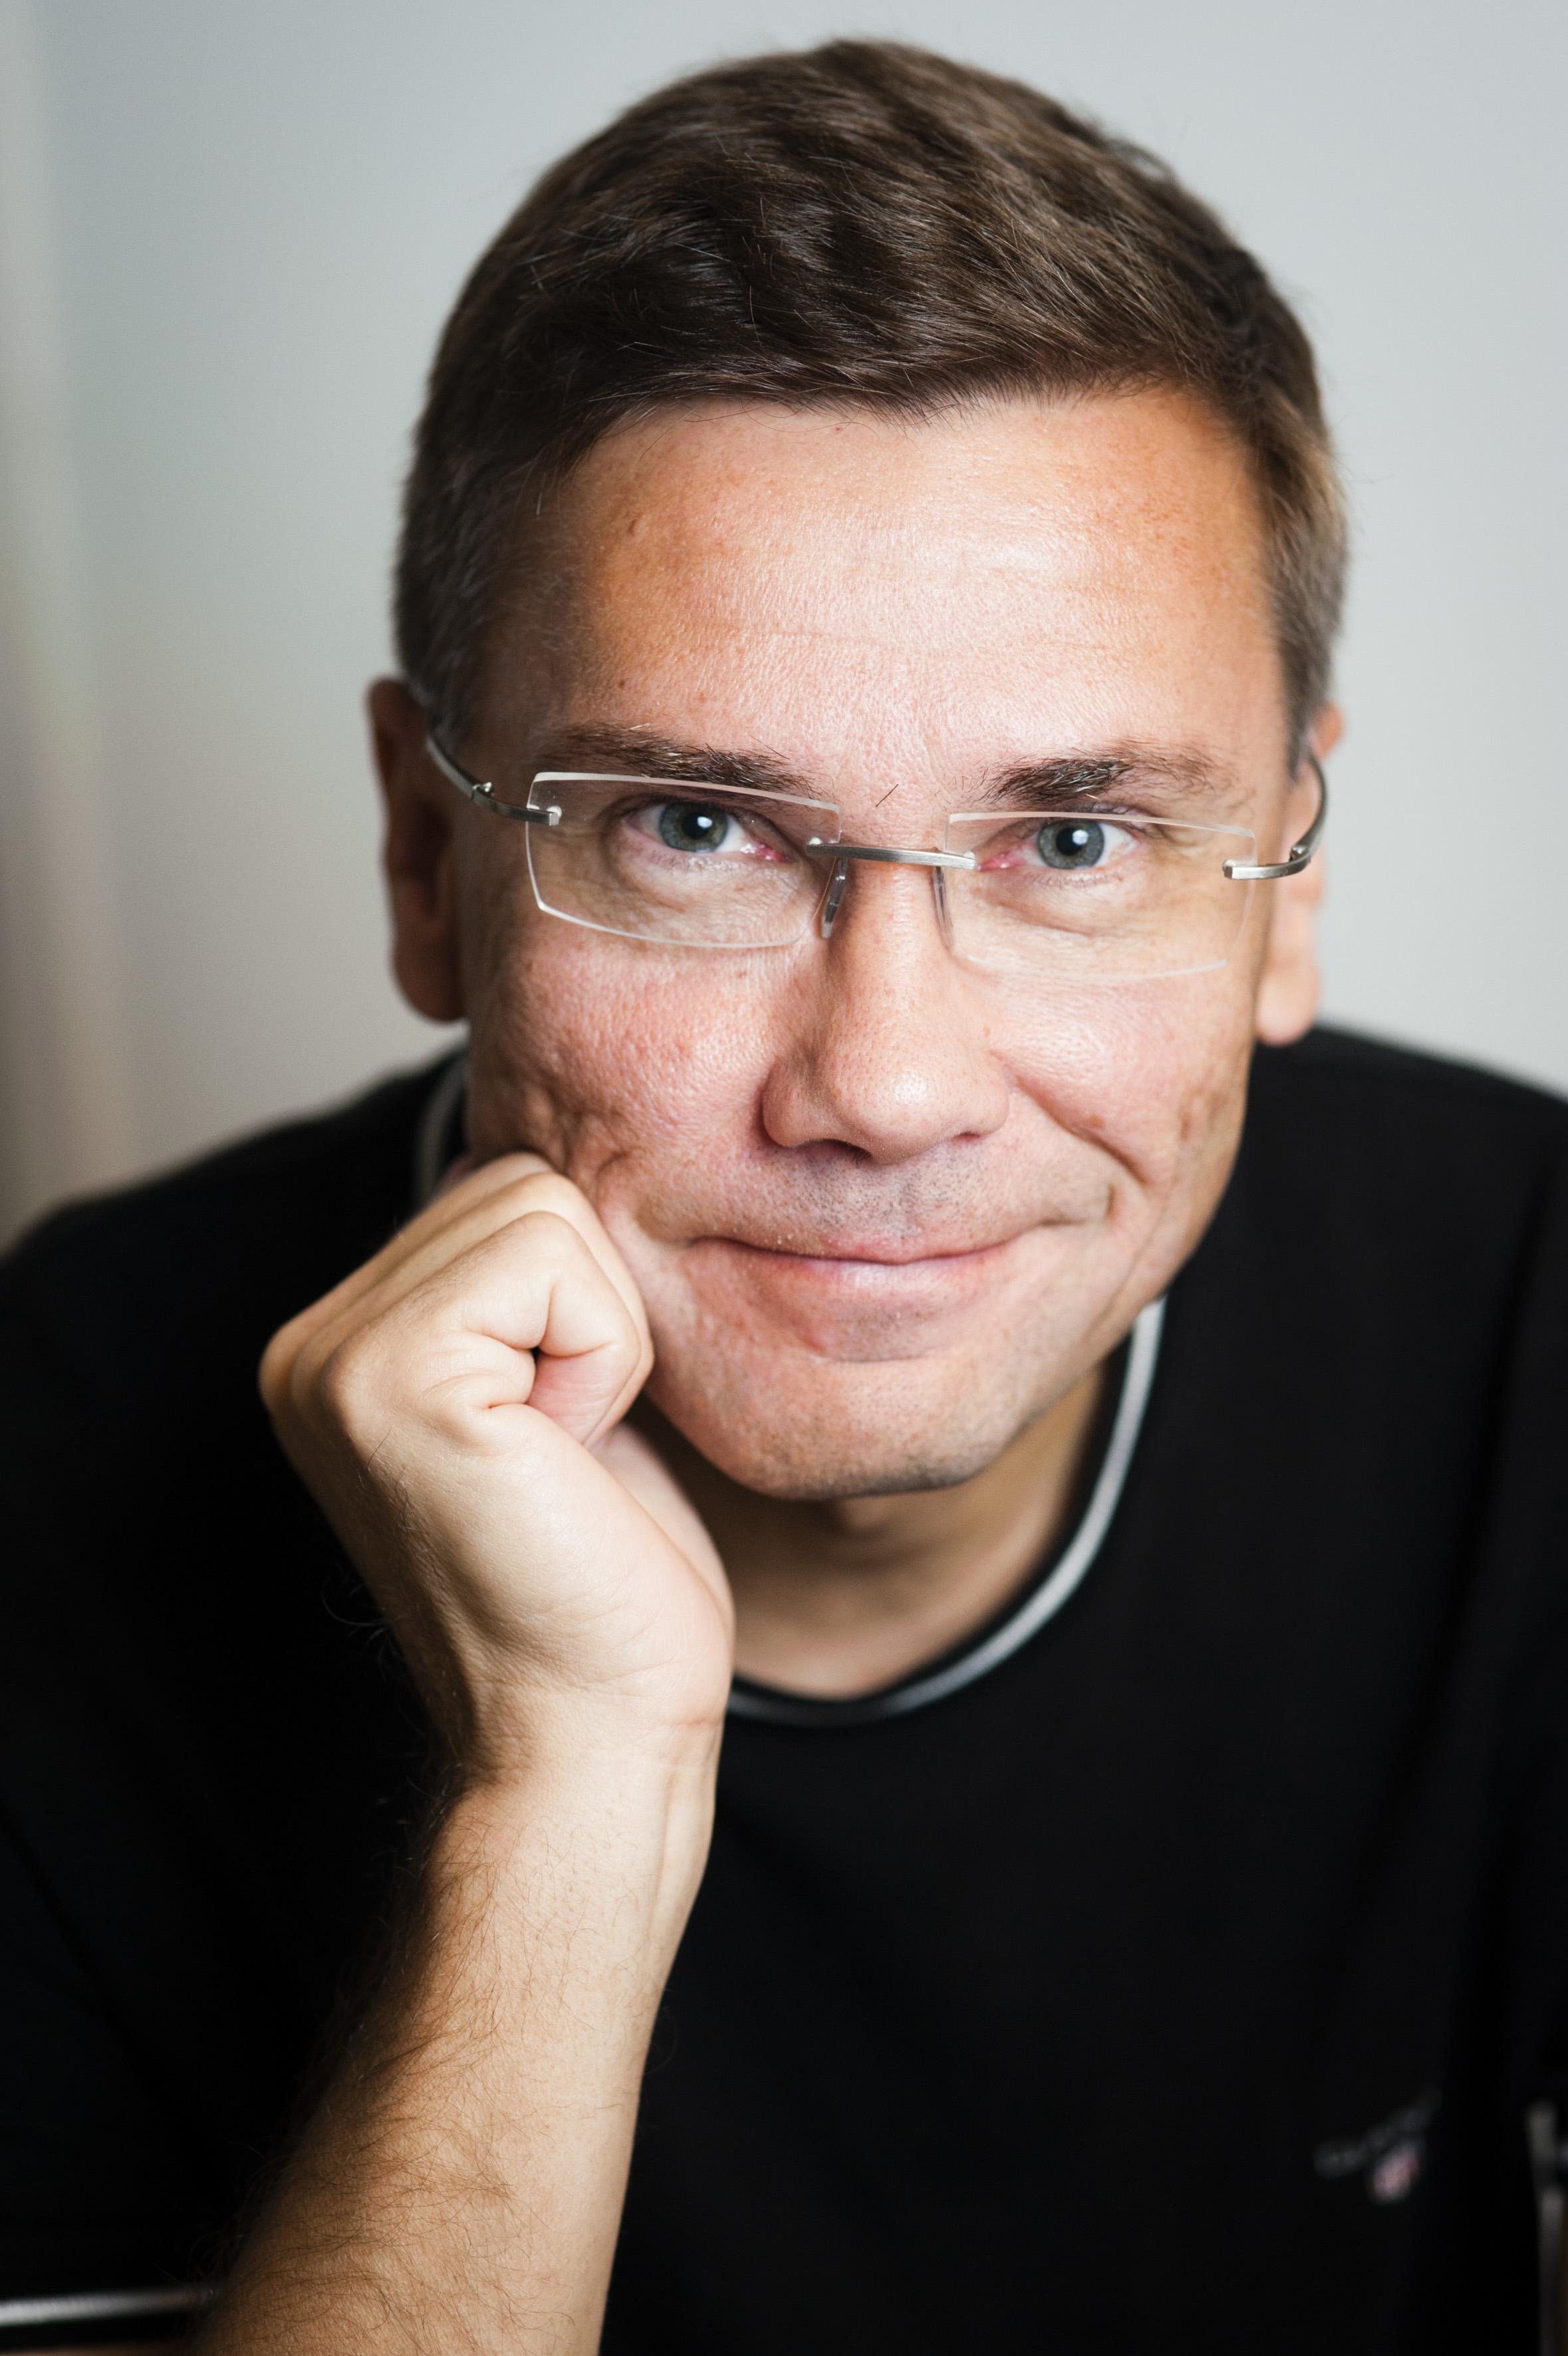 Lauri_Aaltonen_1.jpg